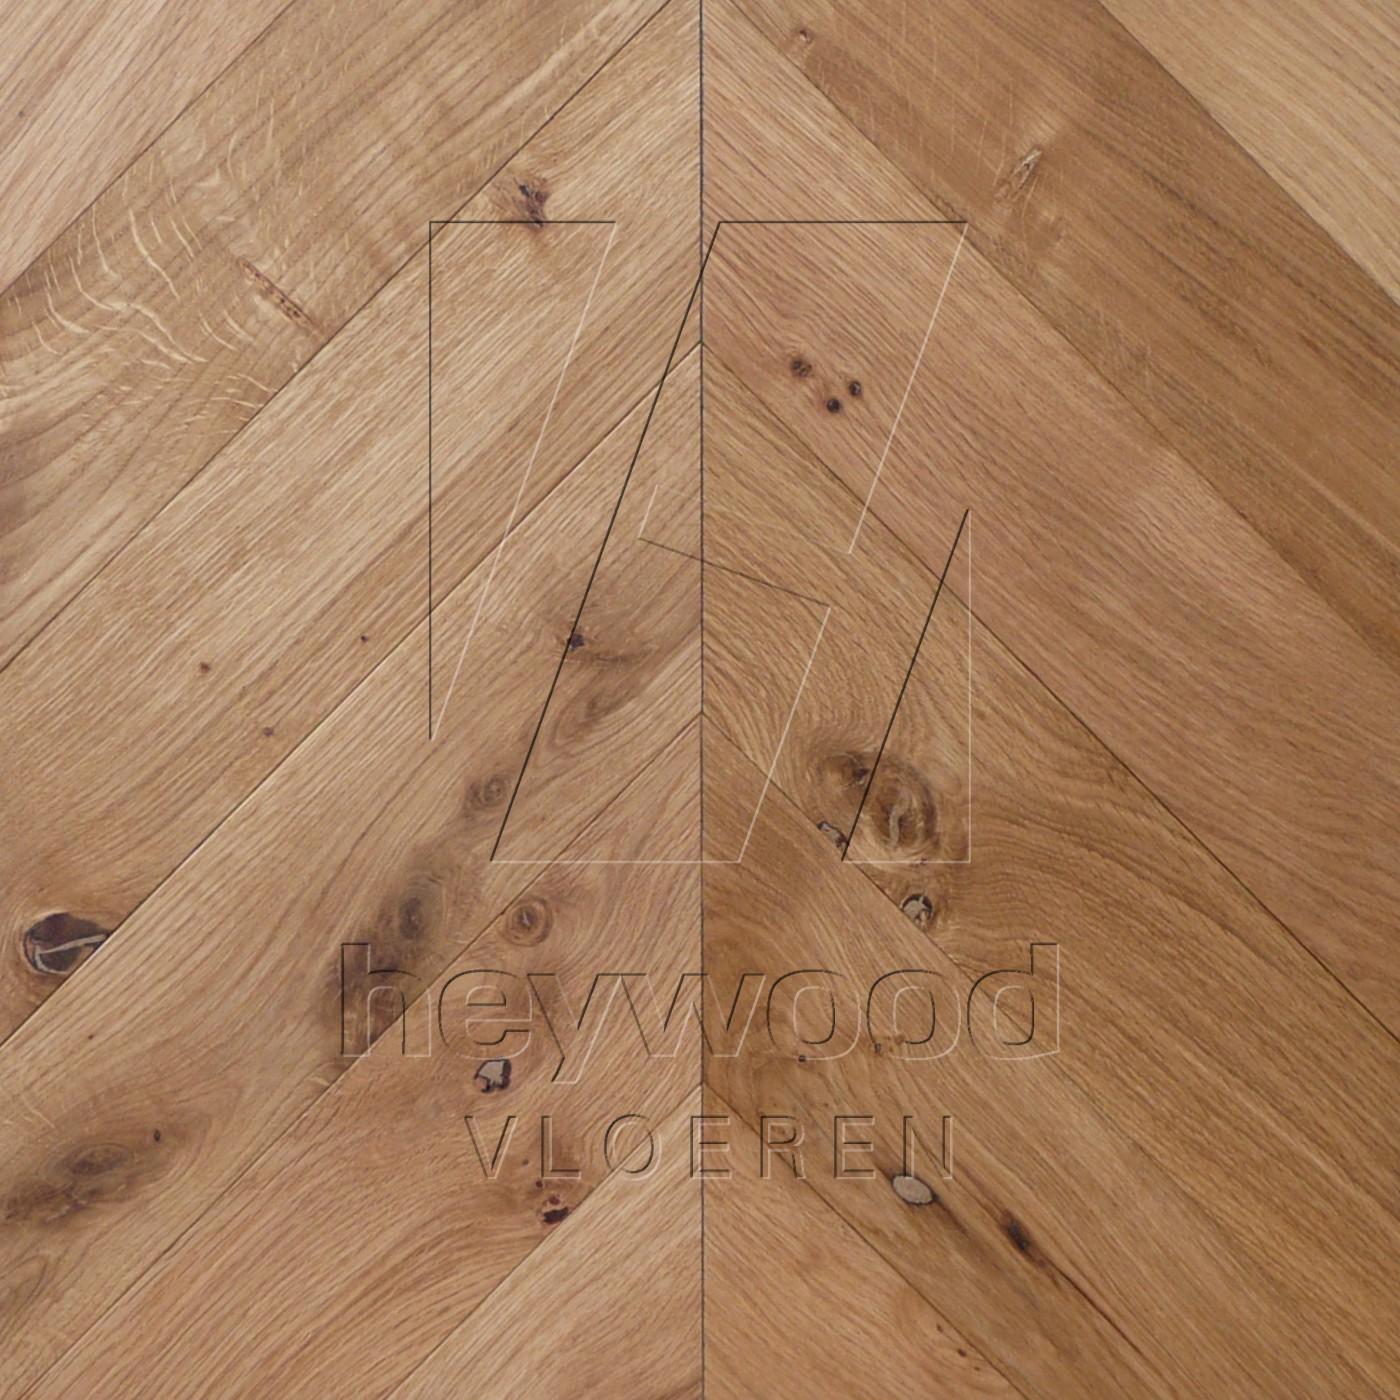 'Rhine Coloured' Chevron 45°, Bespoke Character in Chevron of Pattern & Panel Floors